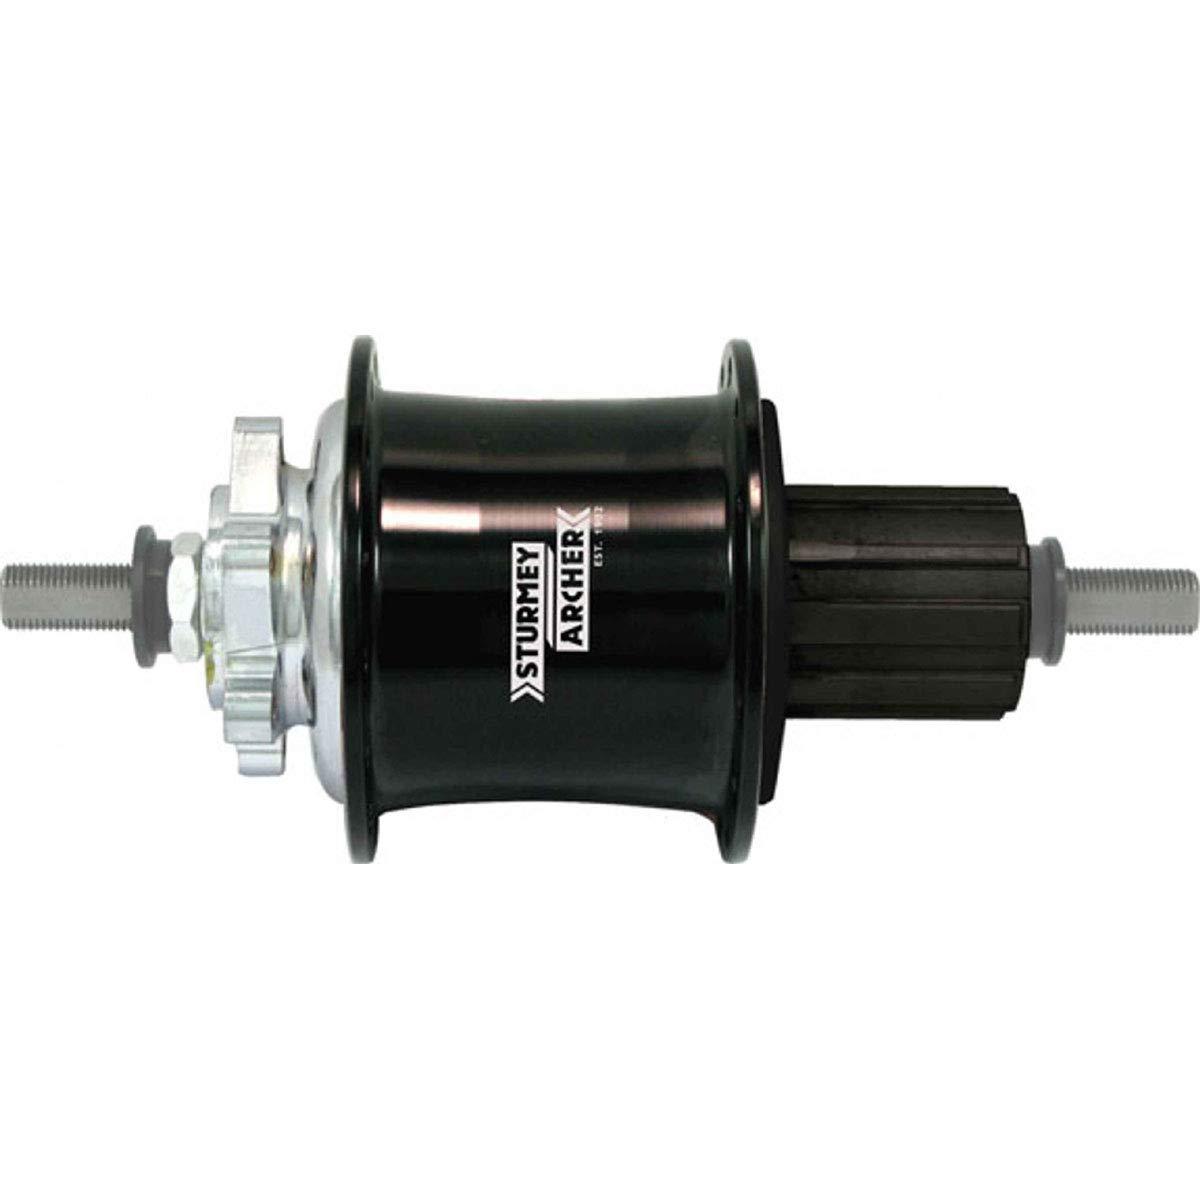 Sturmey Archer Cs-Rk3 3 speed Cass hub 32 black